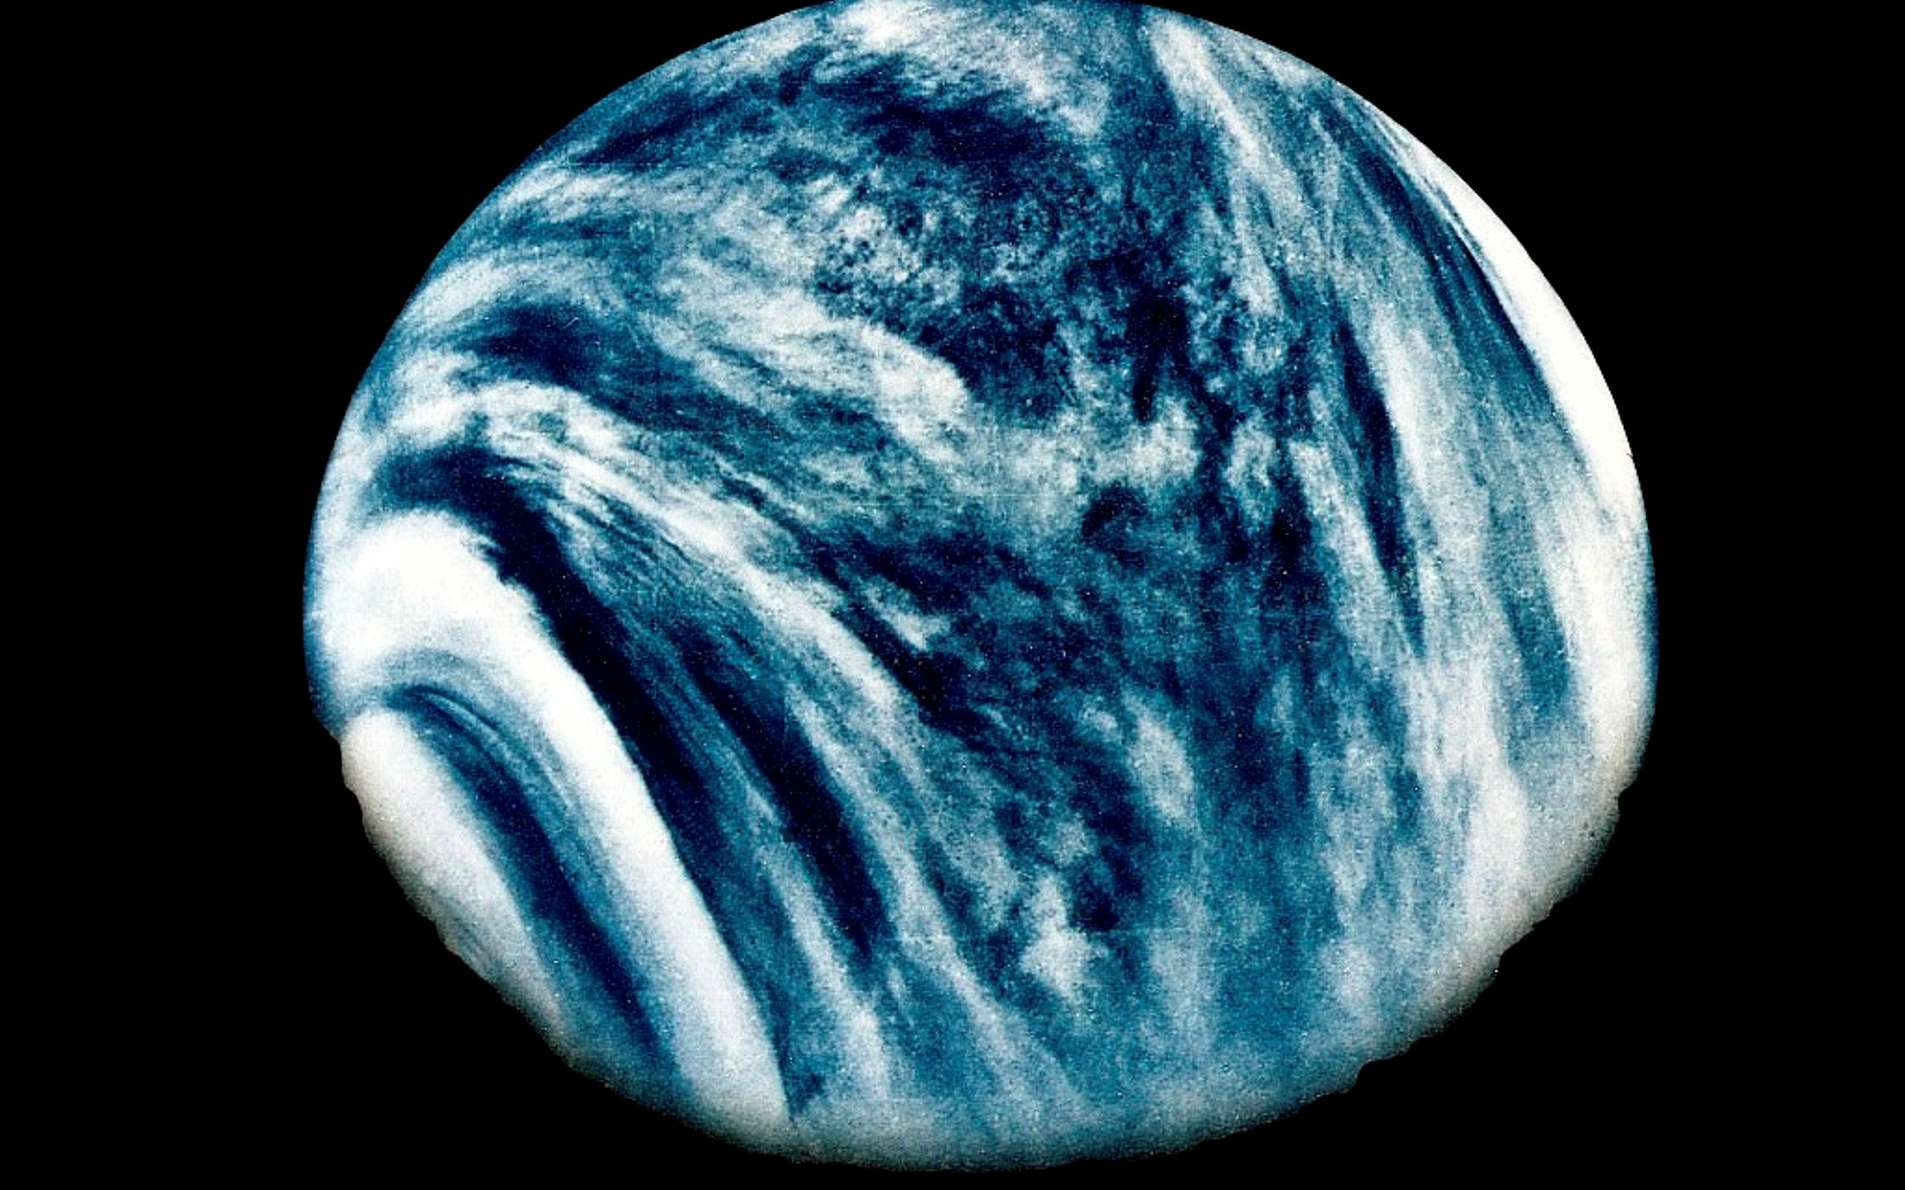 Vénus photographiée le 5 février 1974 par la sonde Mariner 10 de la Nasa. © Nasa